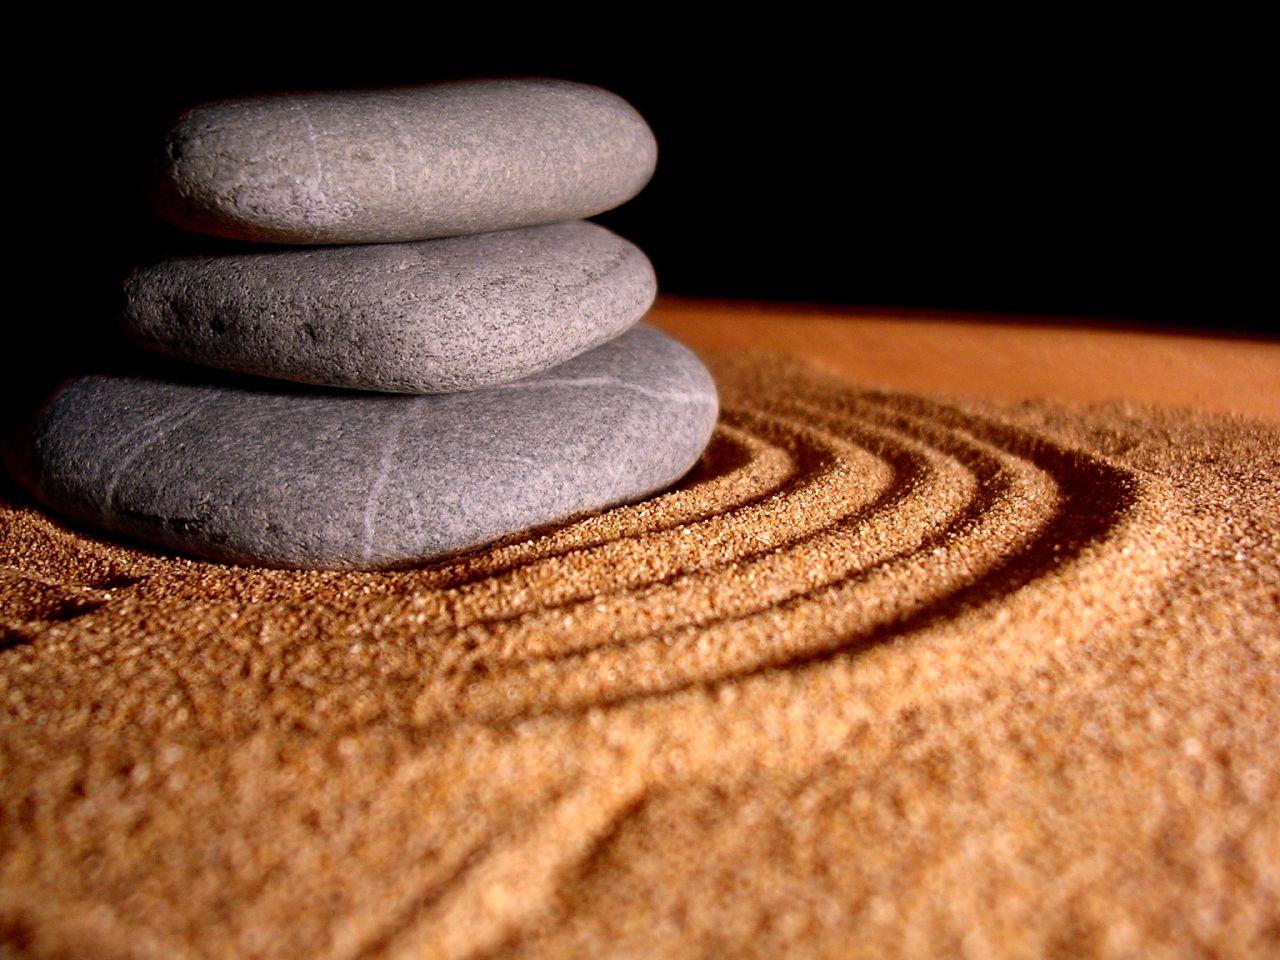 Wallpaper Zen Screensavers Download Screensavers 1280x960